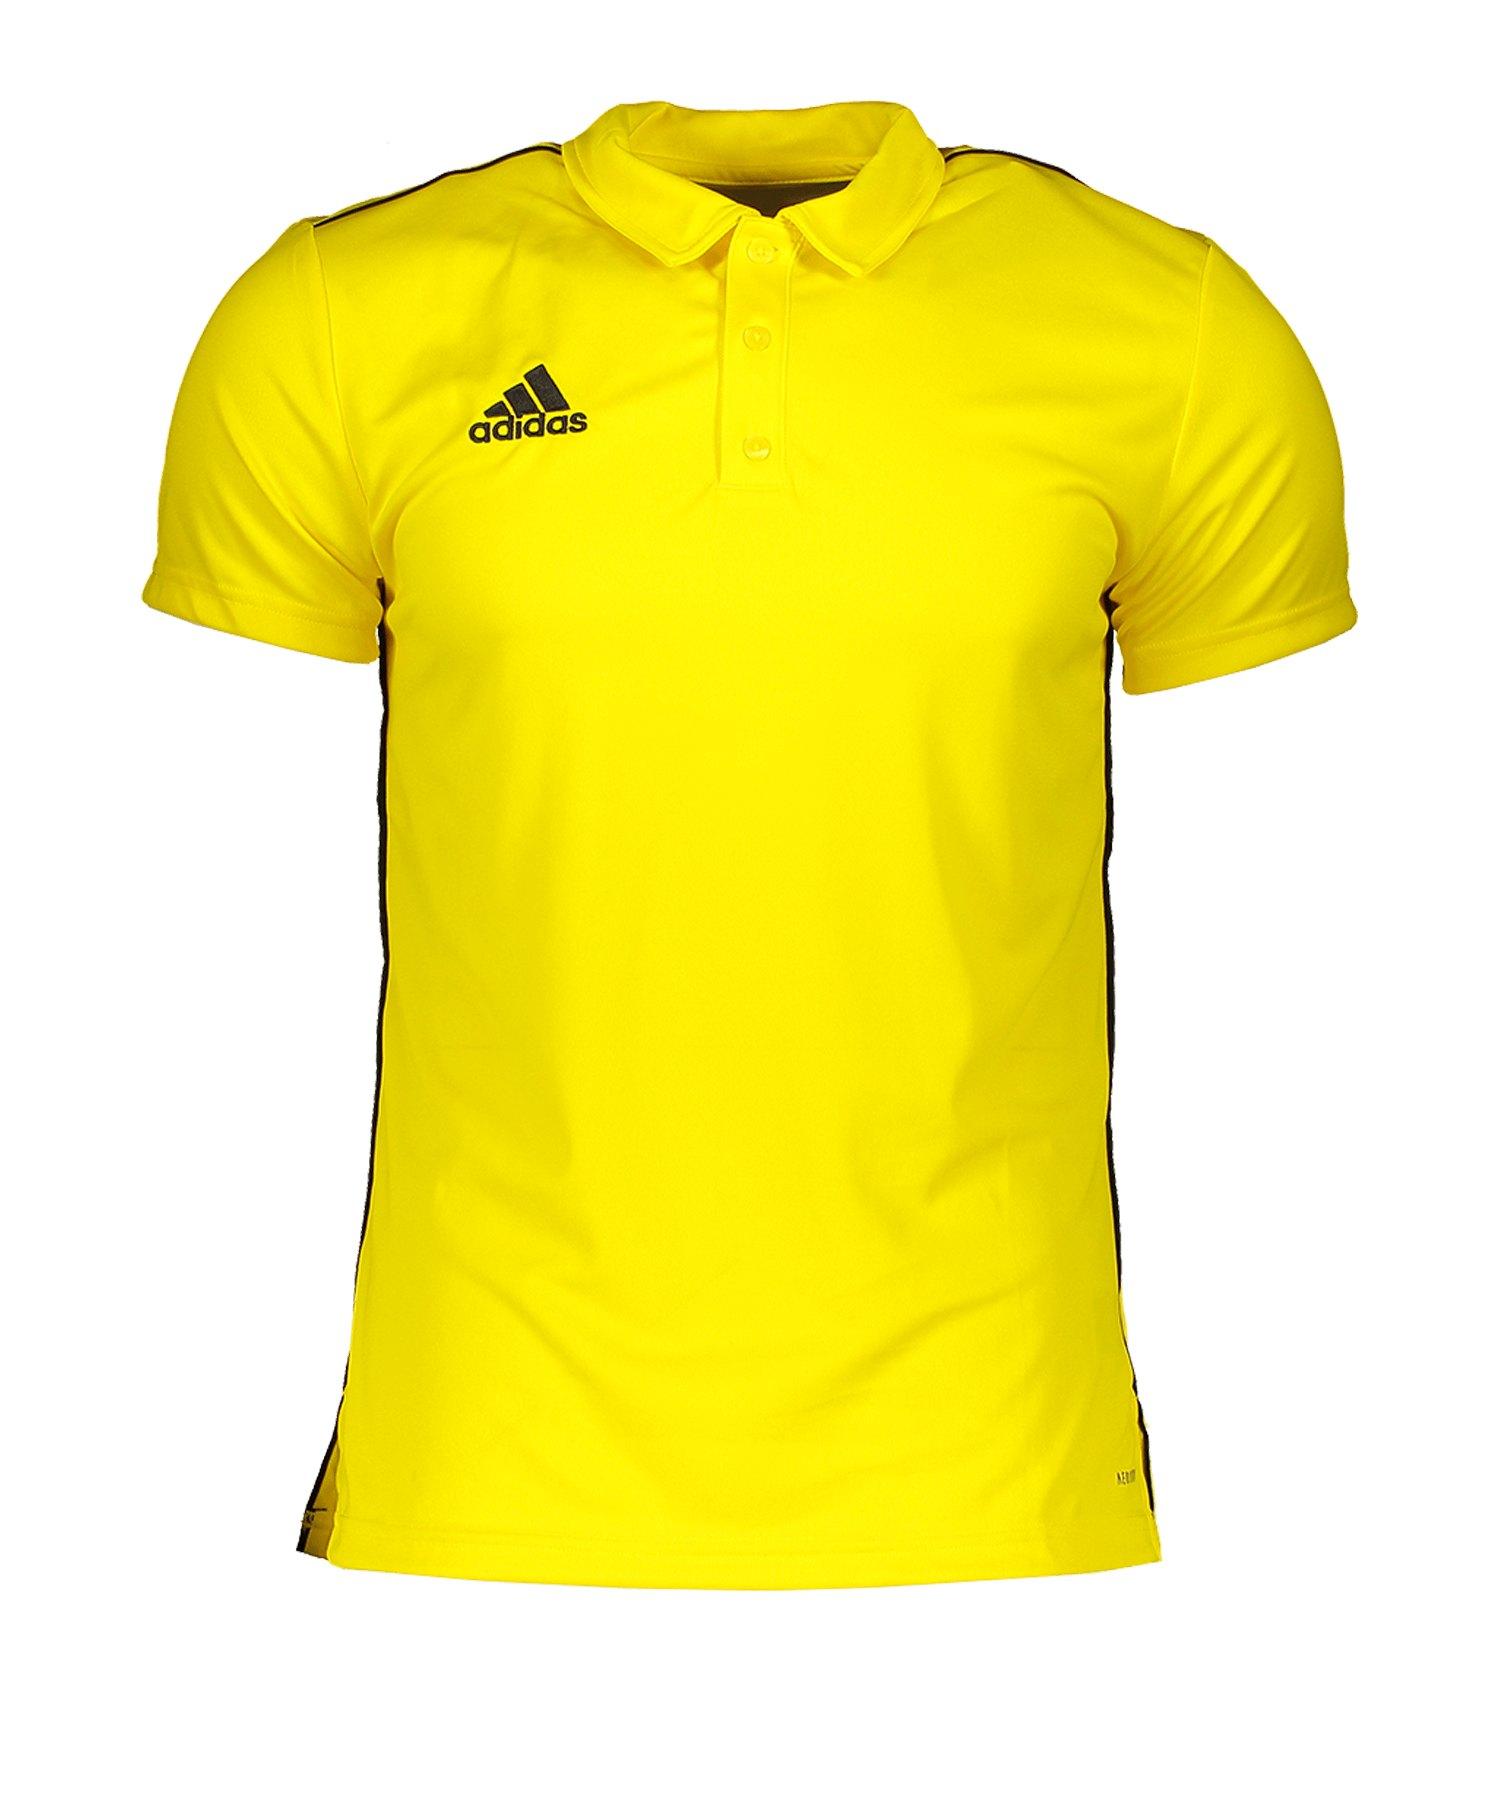 adidas Core 18 Poloshirt Gelb - gelb